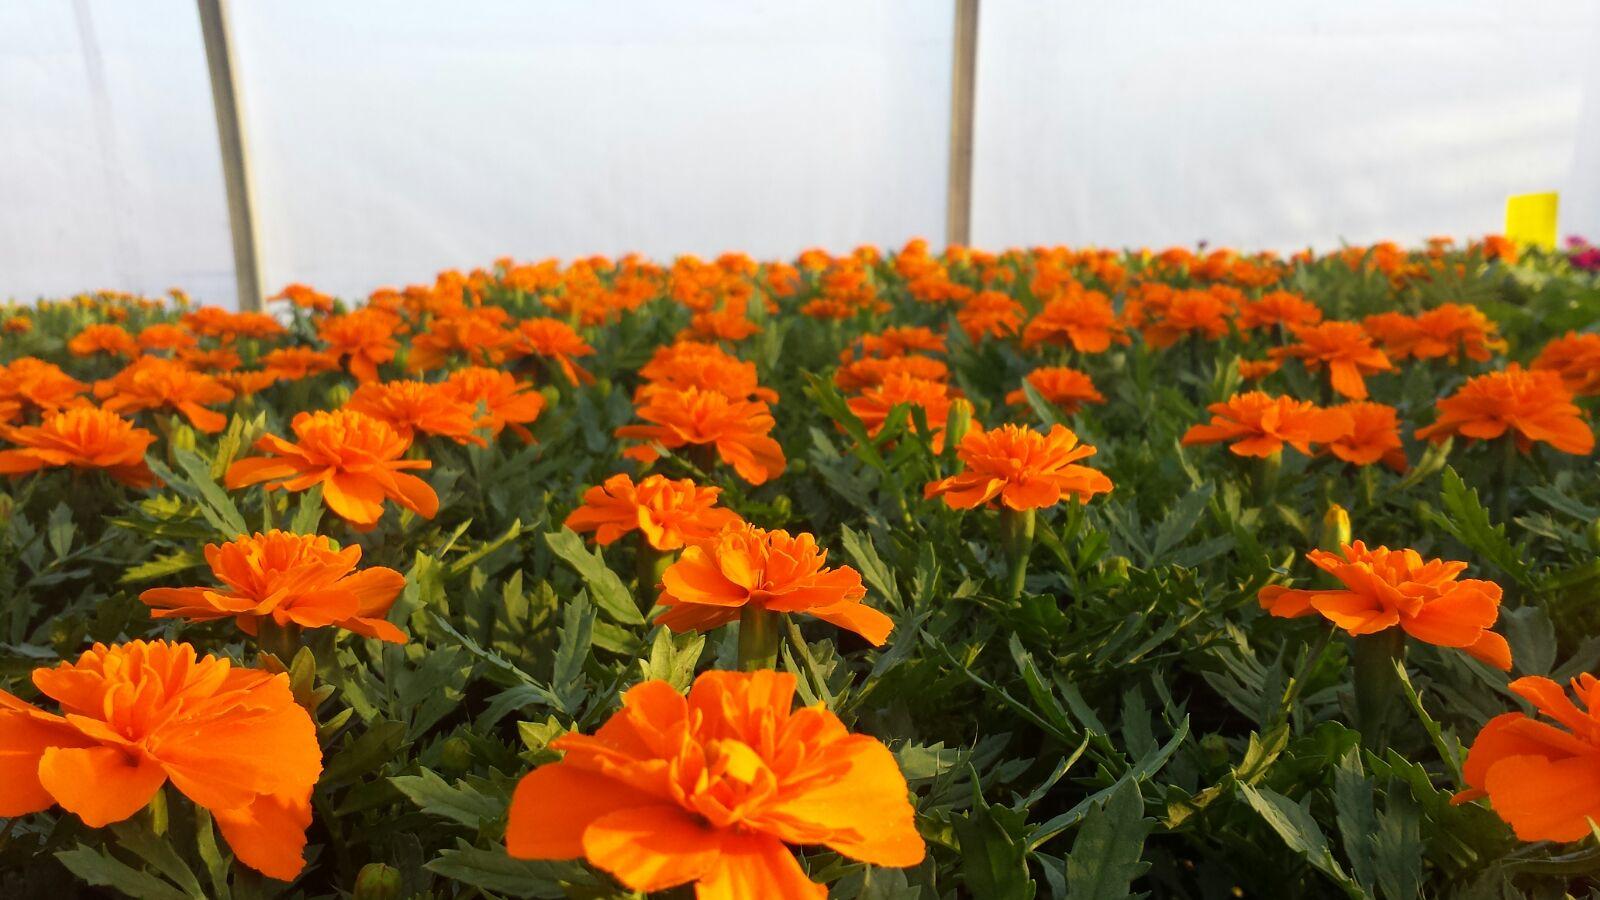 Marigolds 04/26/16